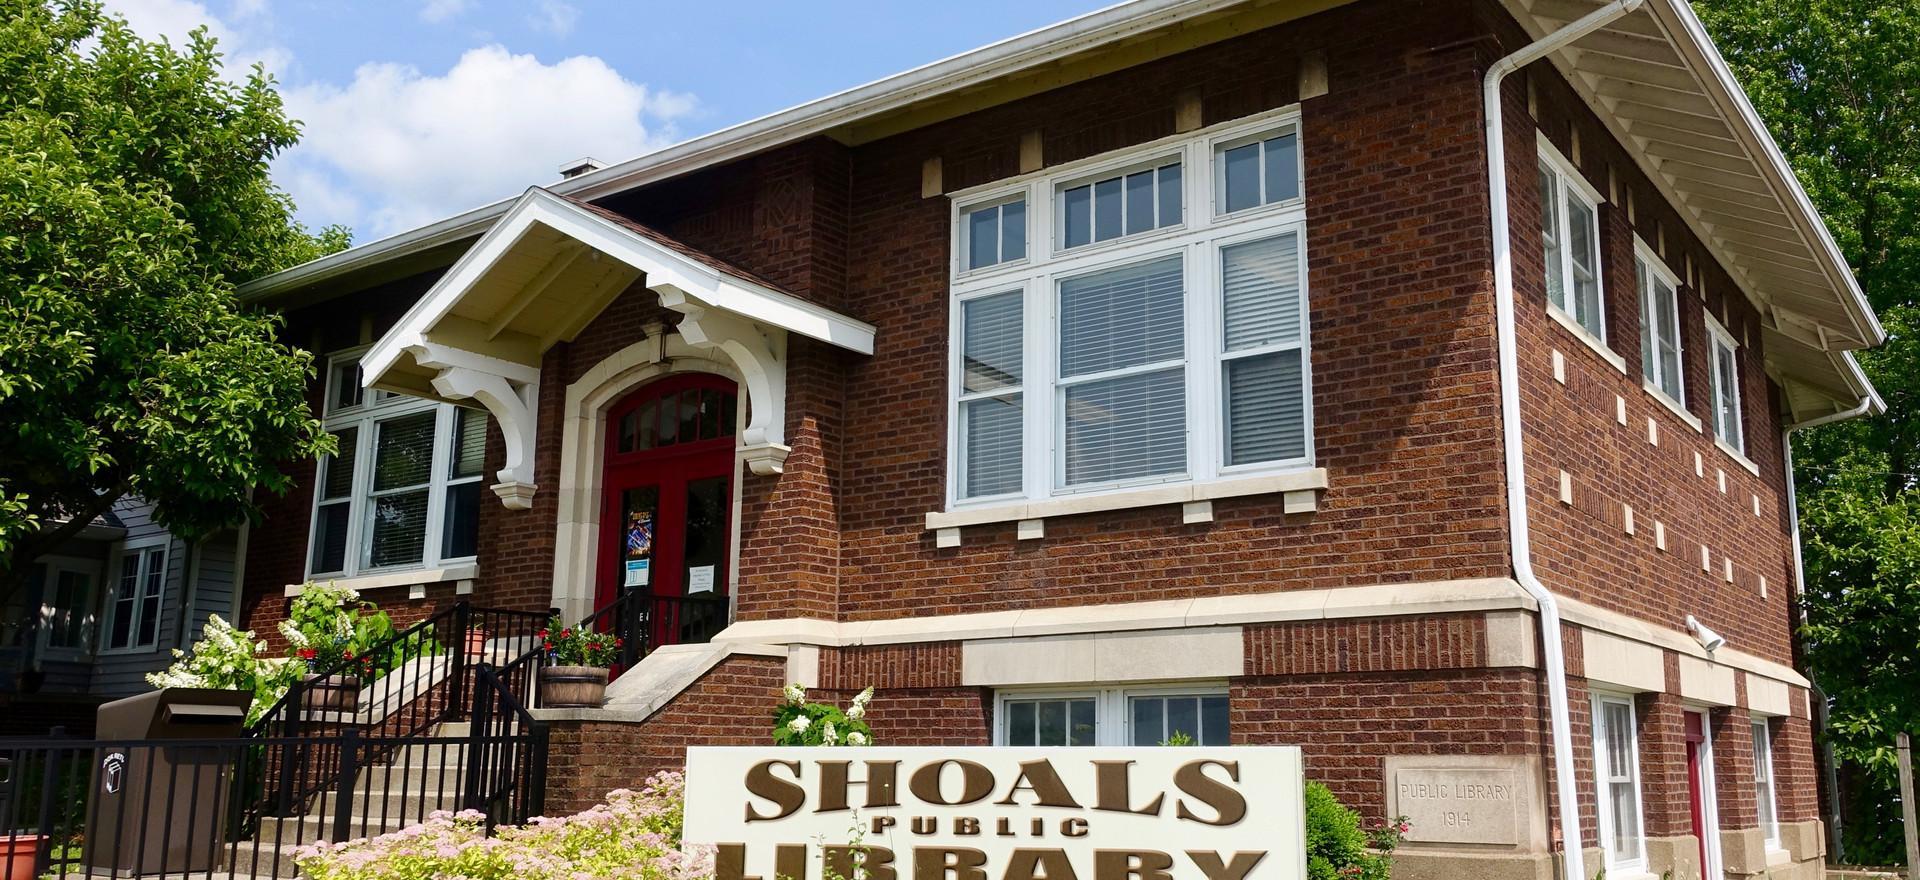 Shoals Public Library Renovation-Addition